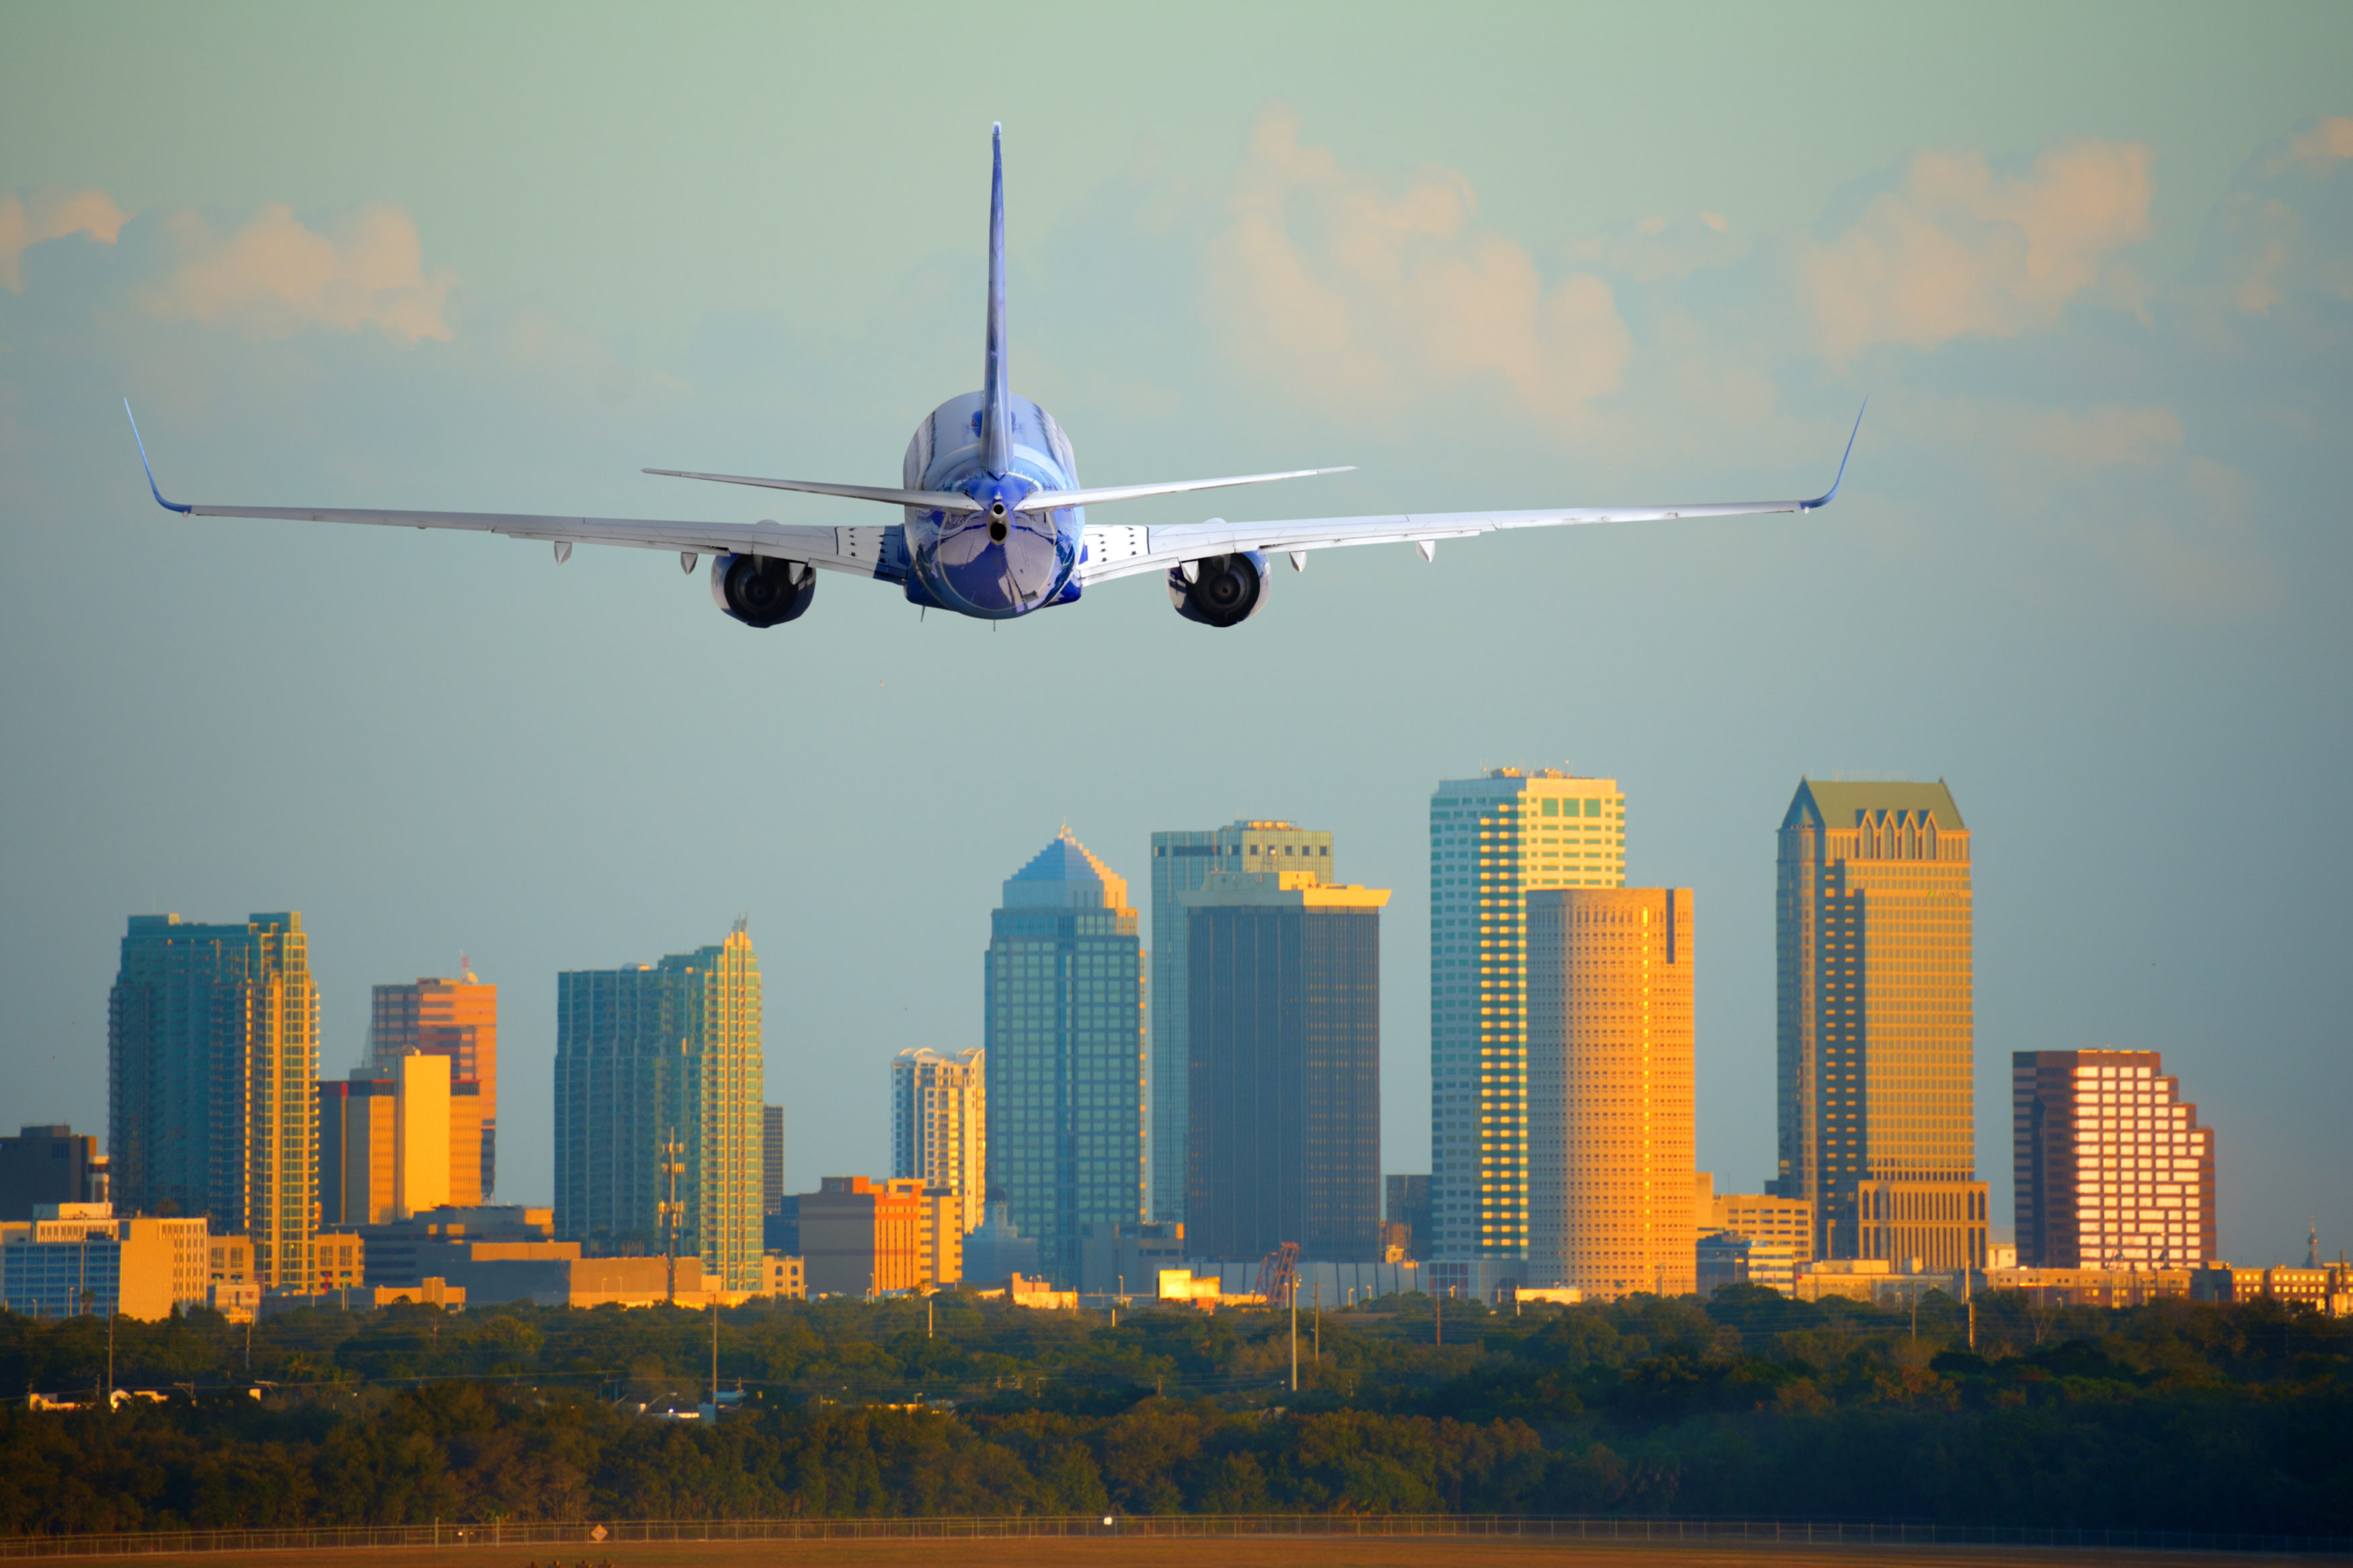 Passenger jet airliner plane arriving or departing Tampa International Airport in Florida at sunset or sunrise